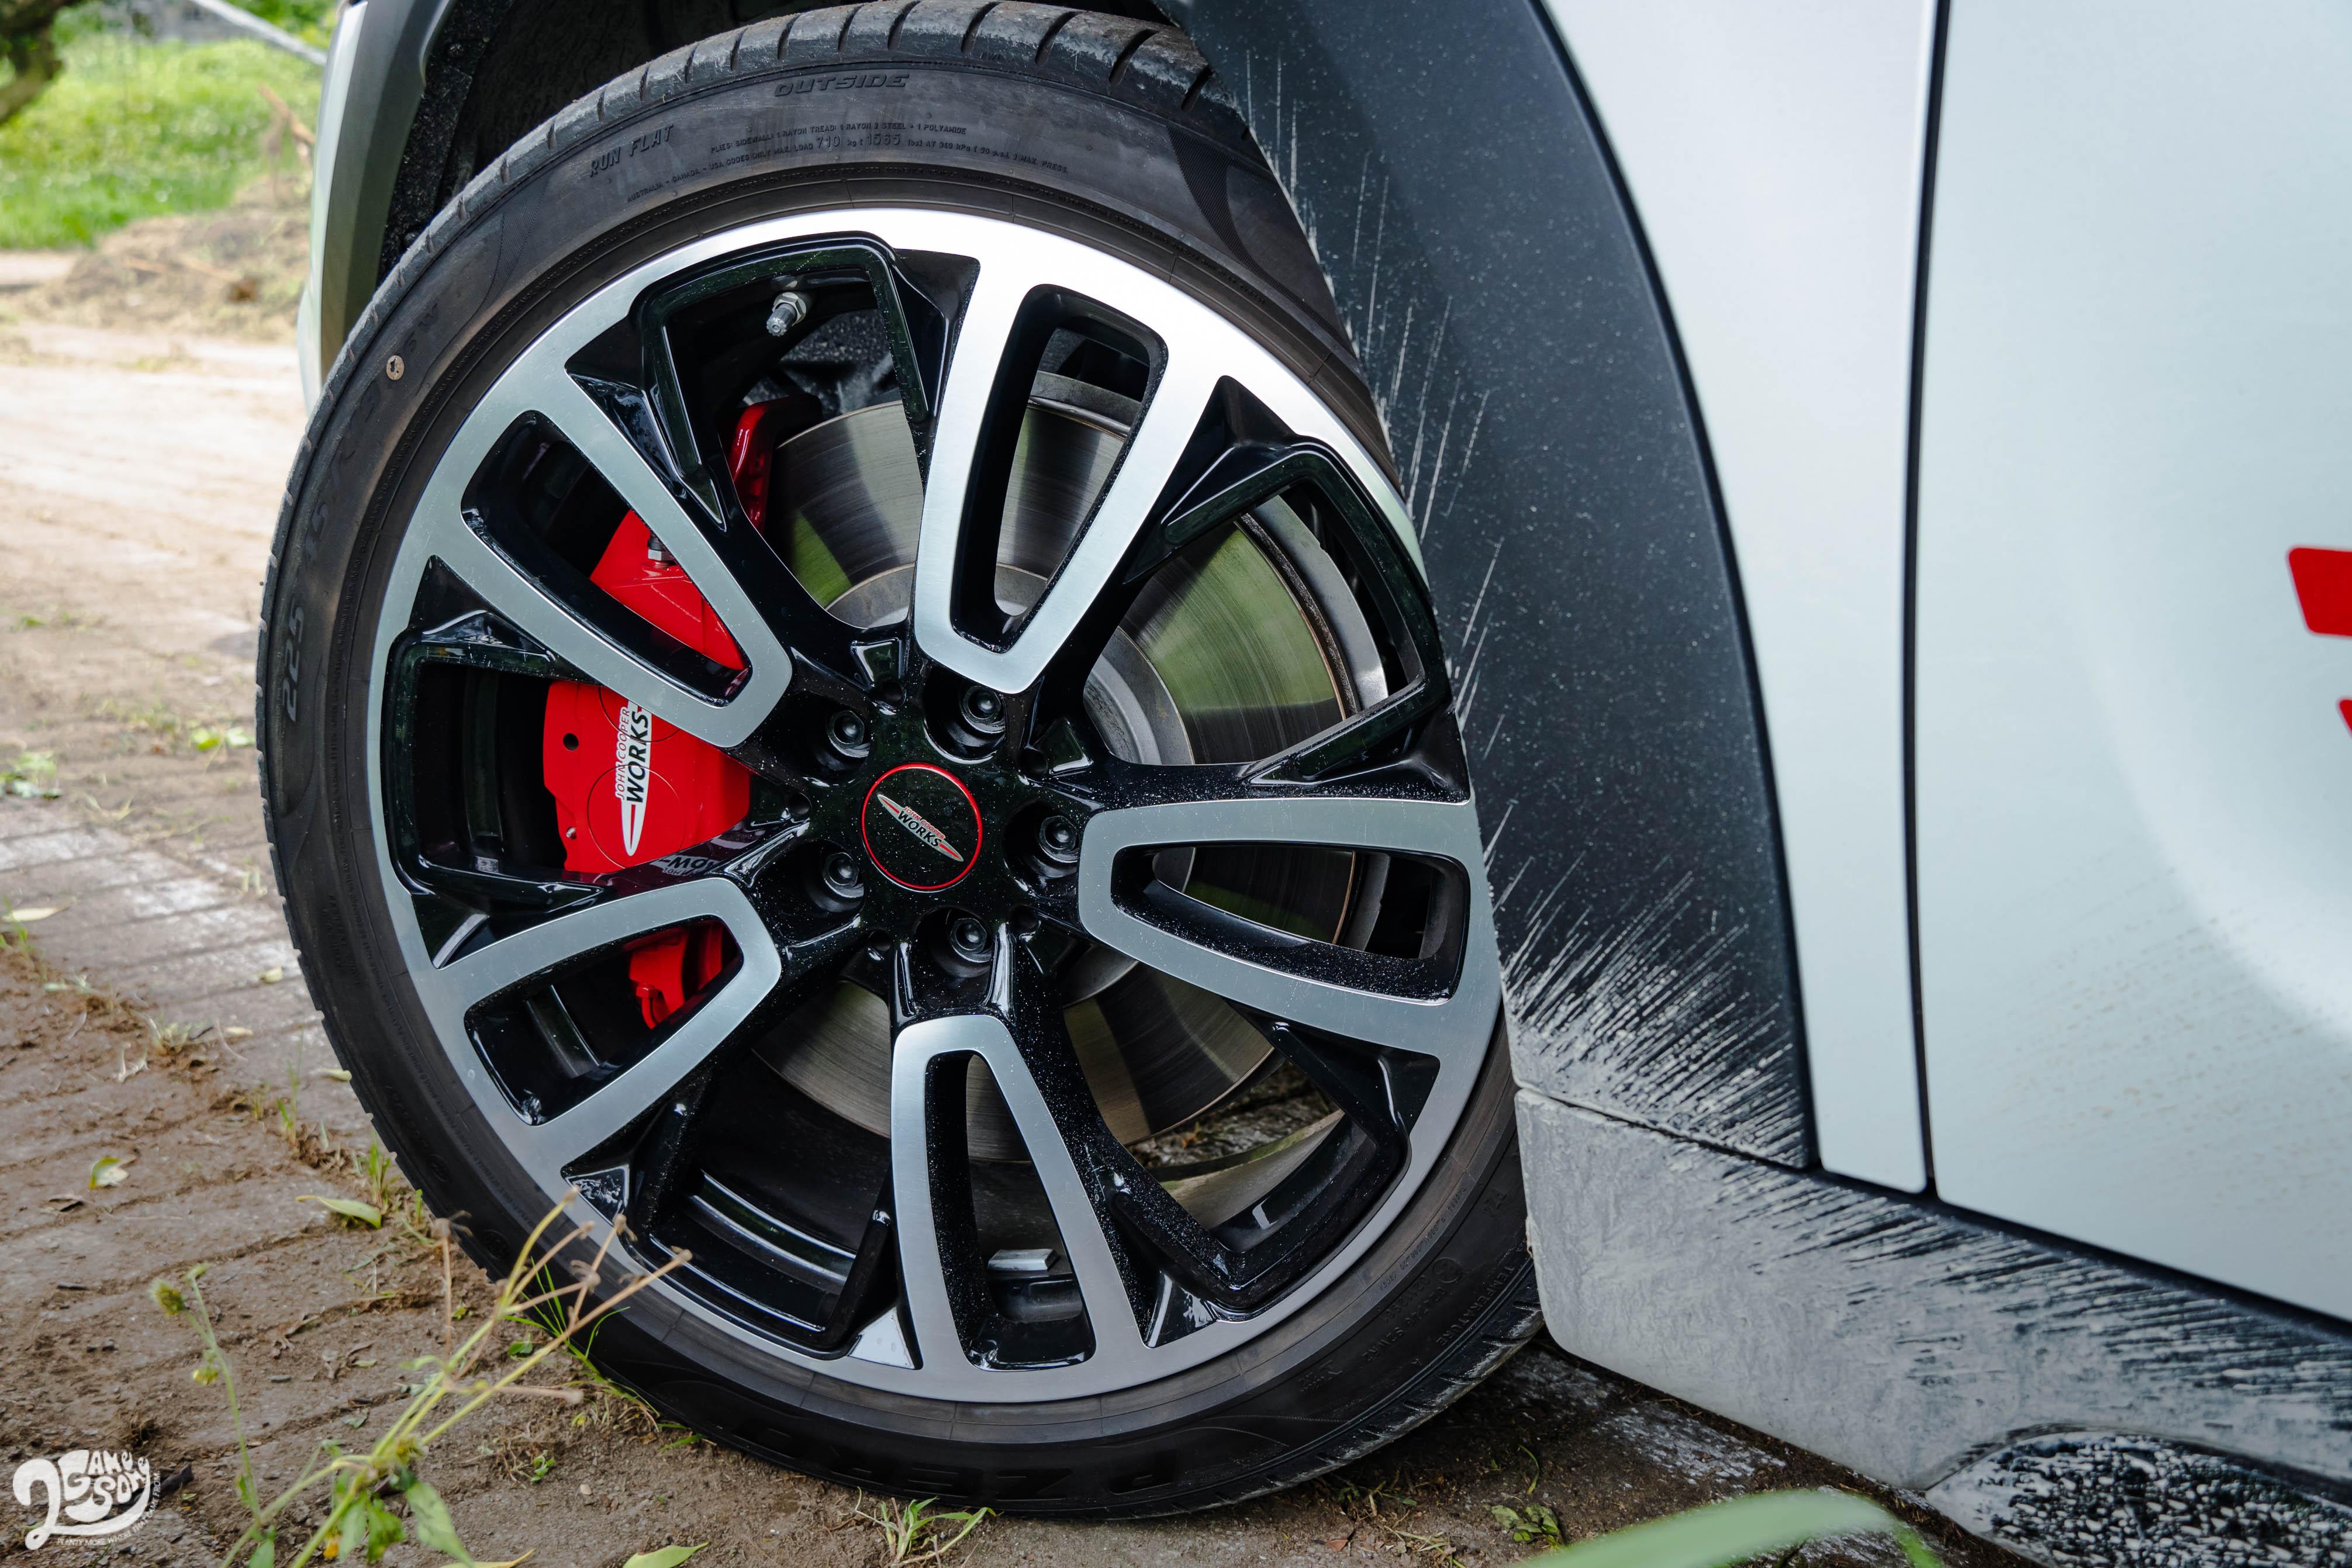 JCW Countryman 配備 19 吋輪圈,配胎為失壓續跑胎。